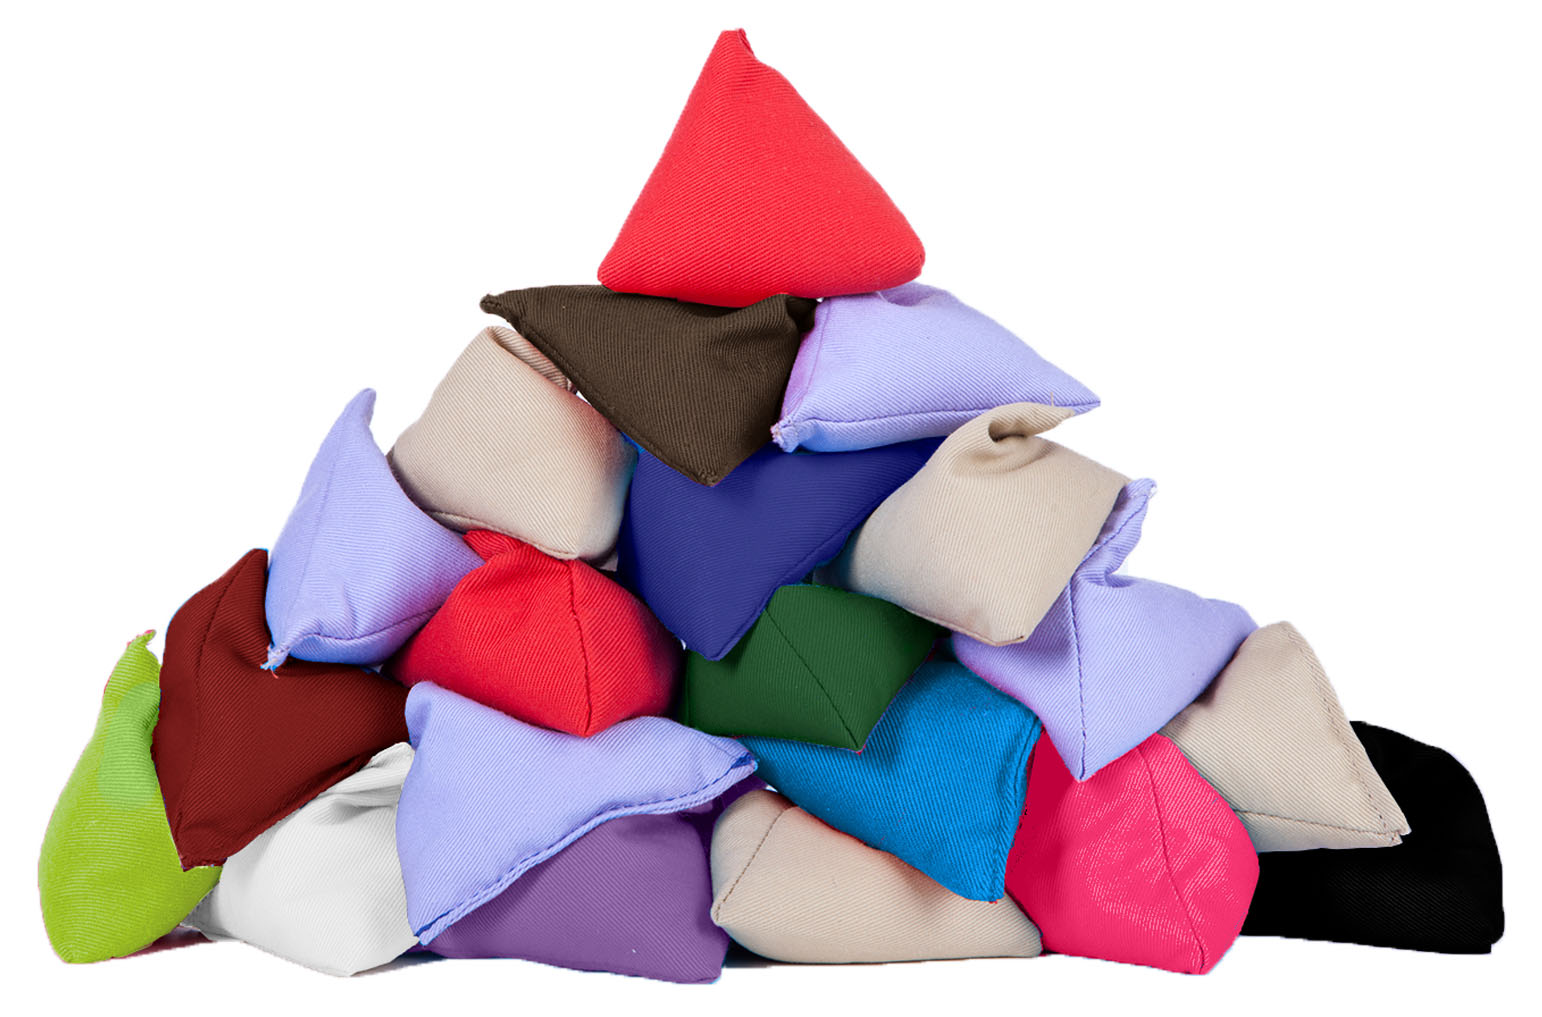 Multipacks Juggling Pyramid Bean Bags Practice Throwing